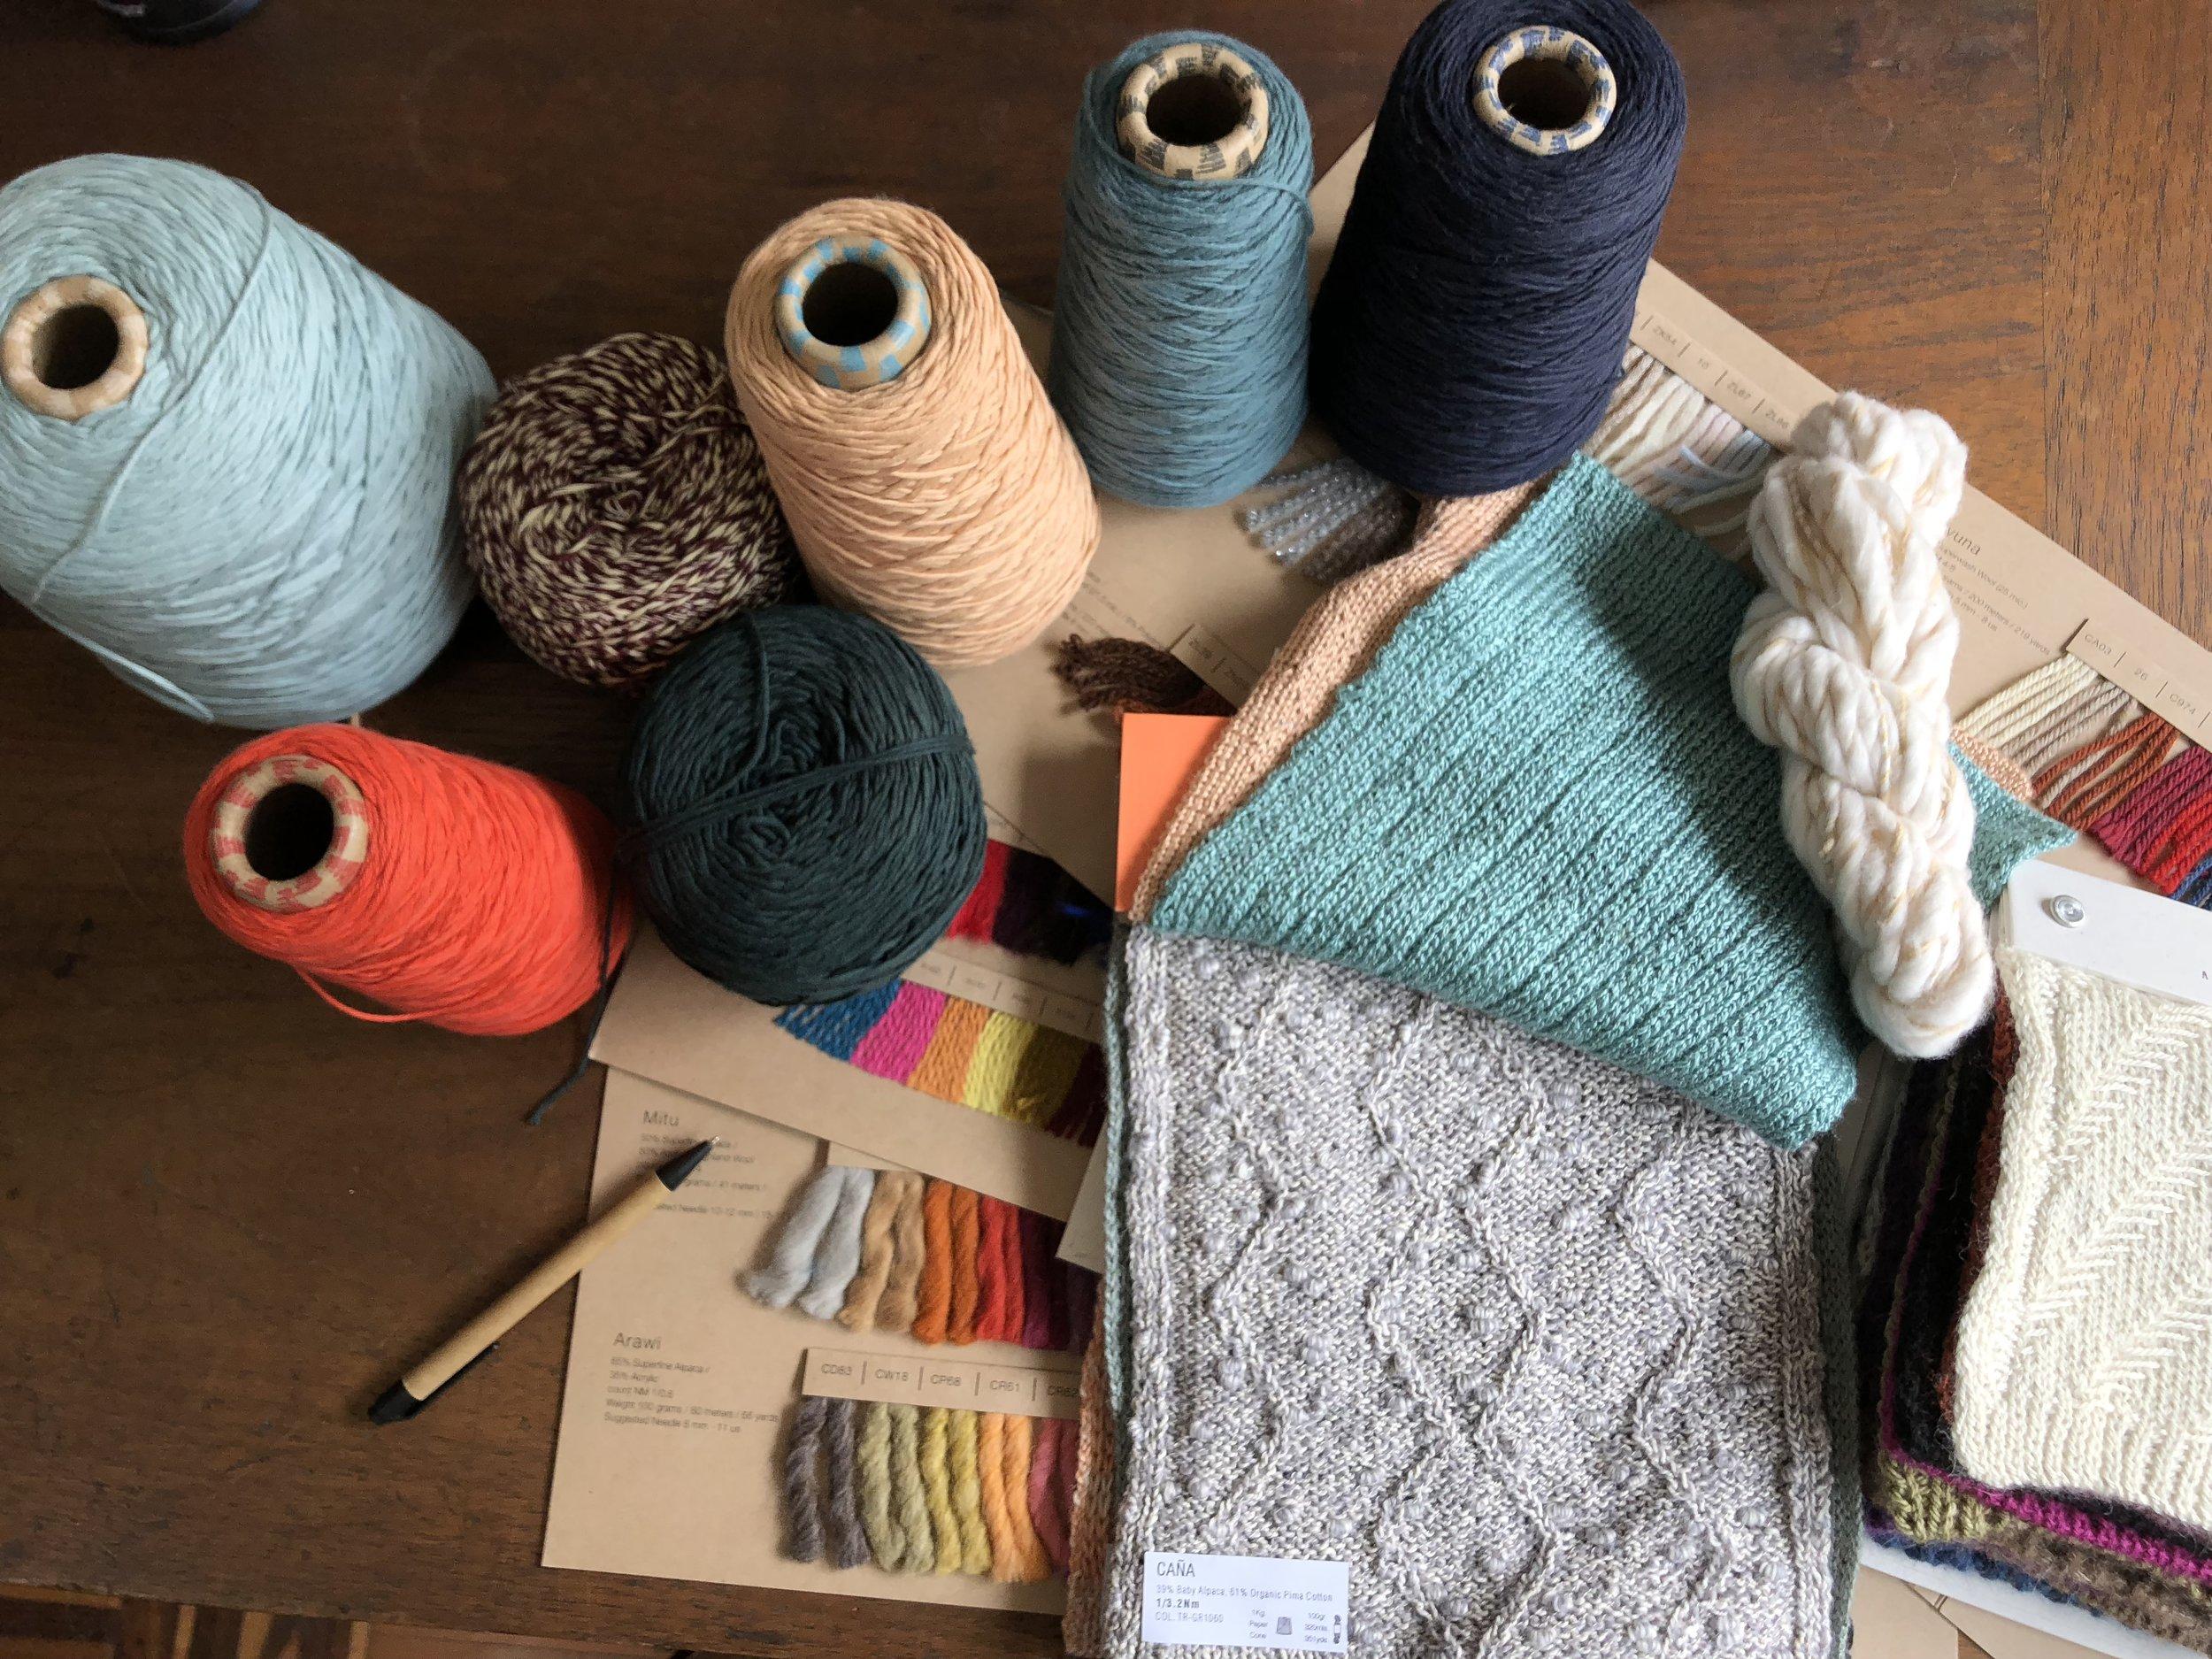 yarn-consultation-knitwear-manufacturing-peru